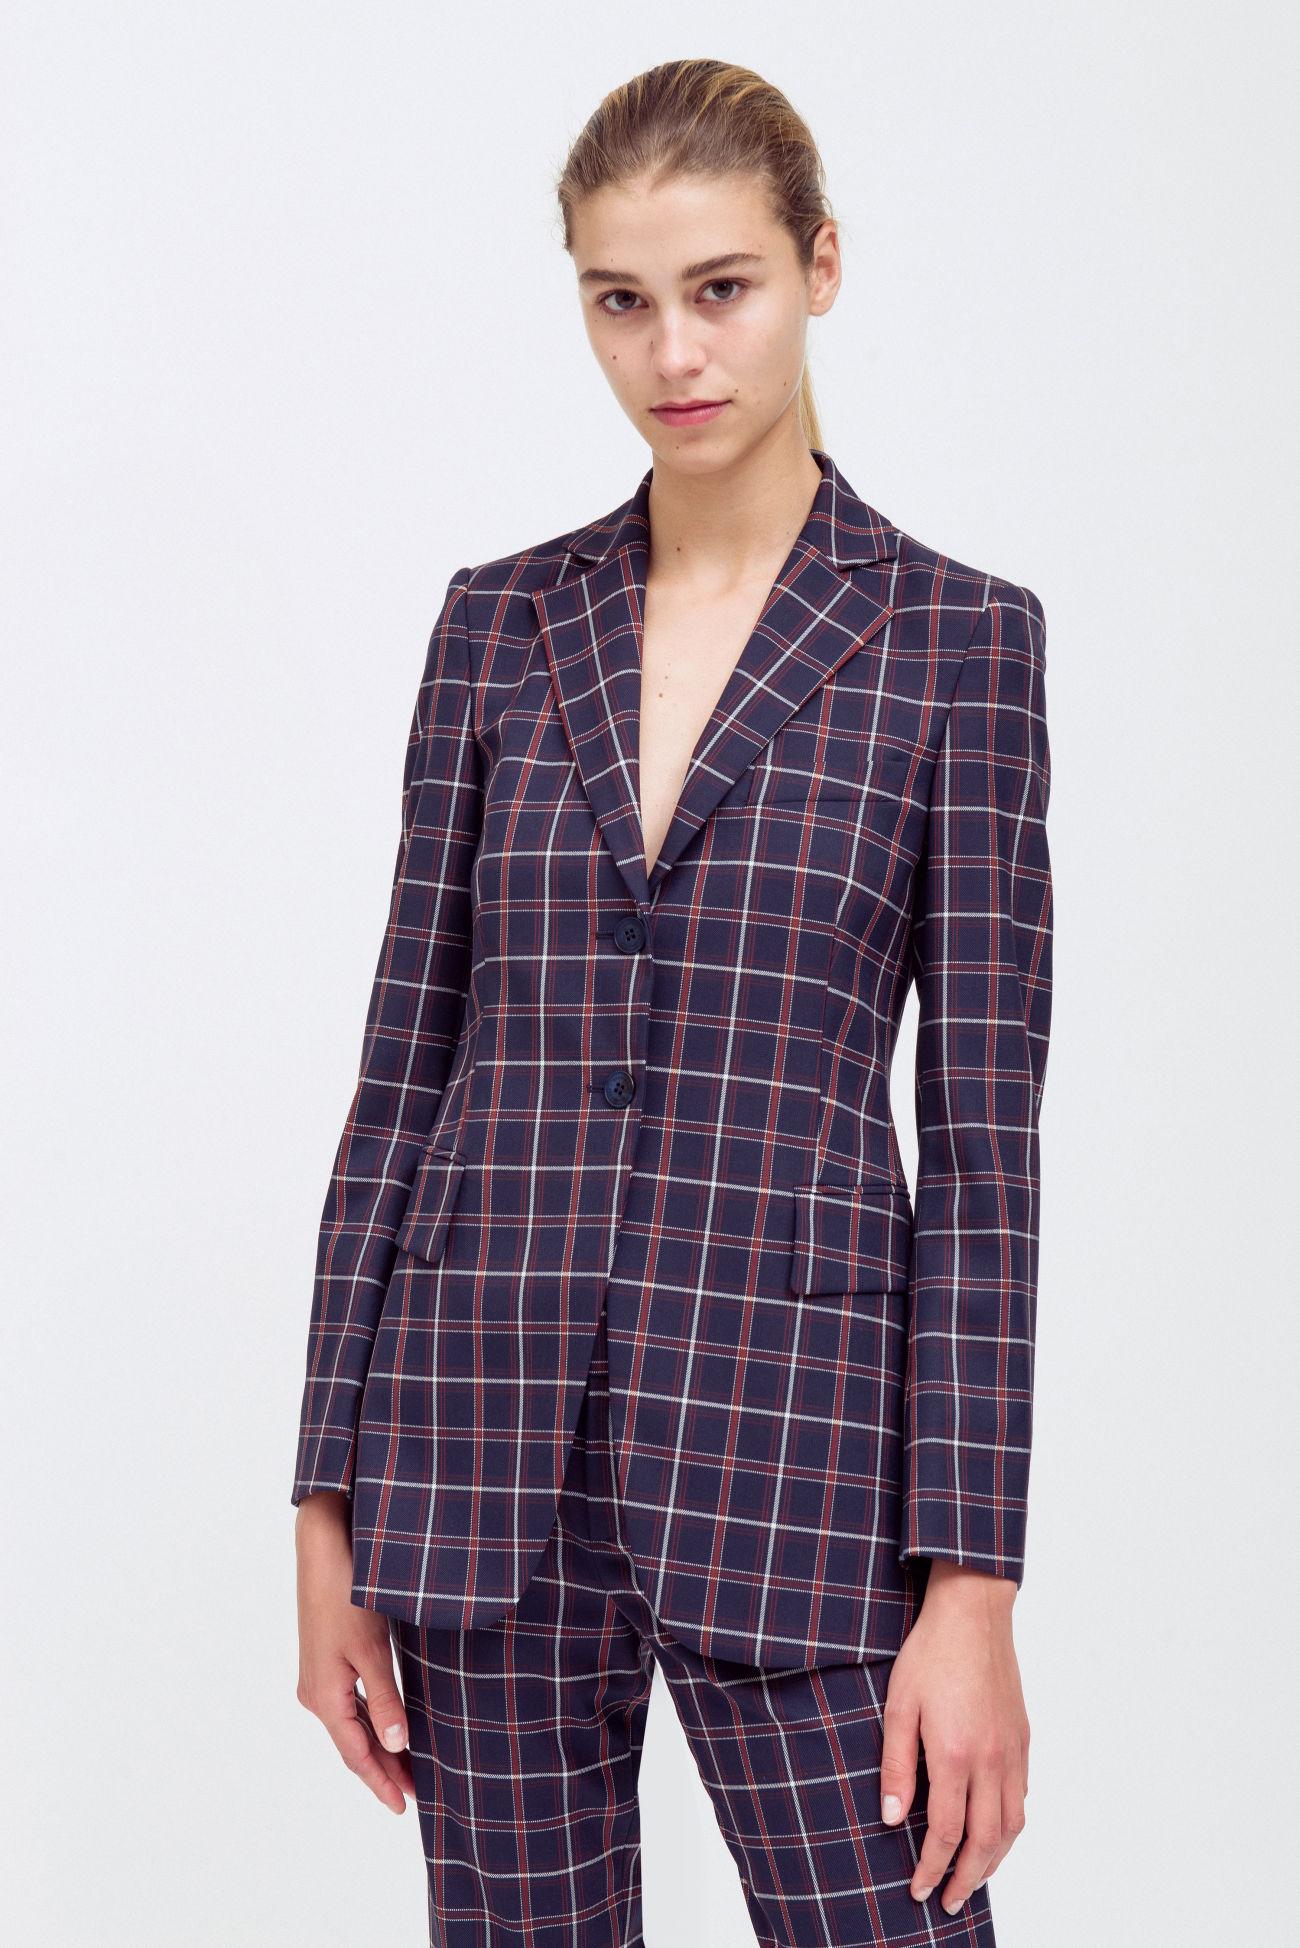 Fashionable two-button blazer